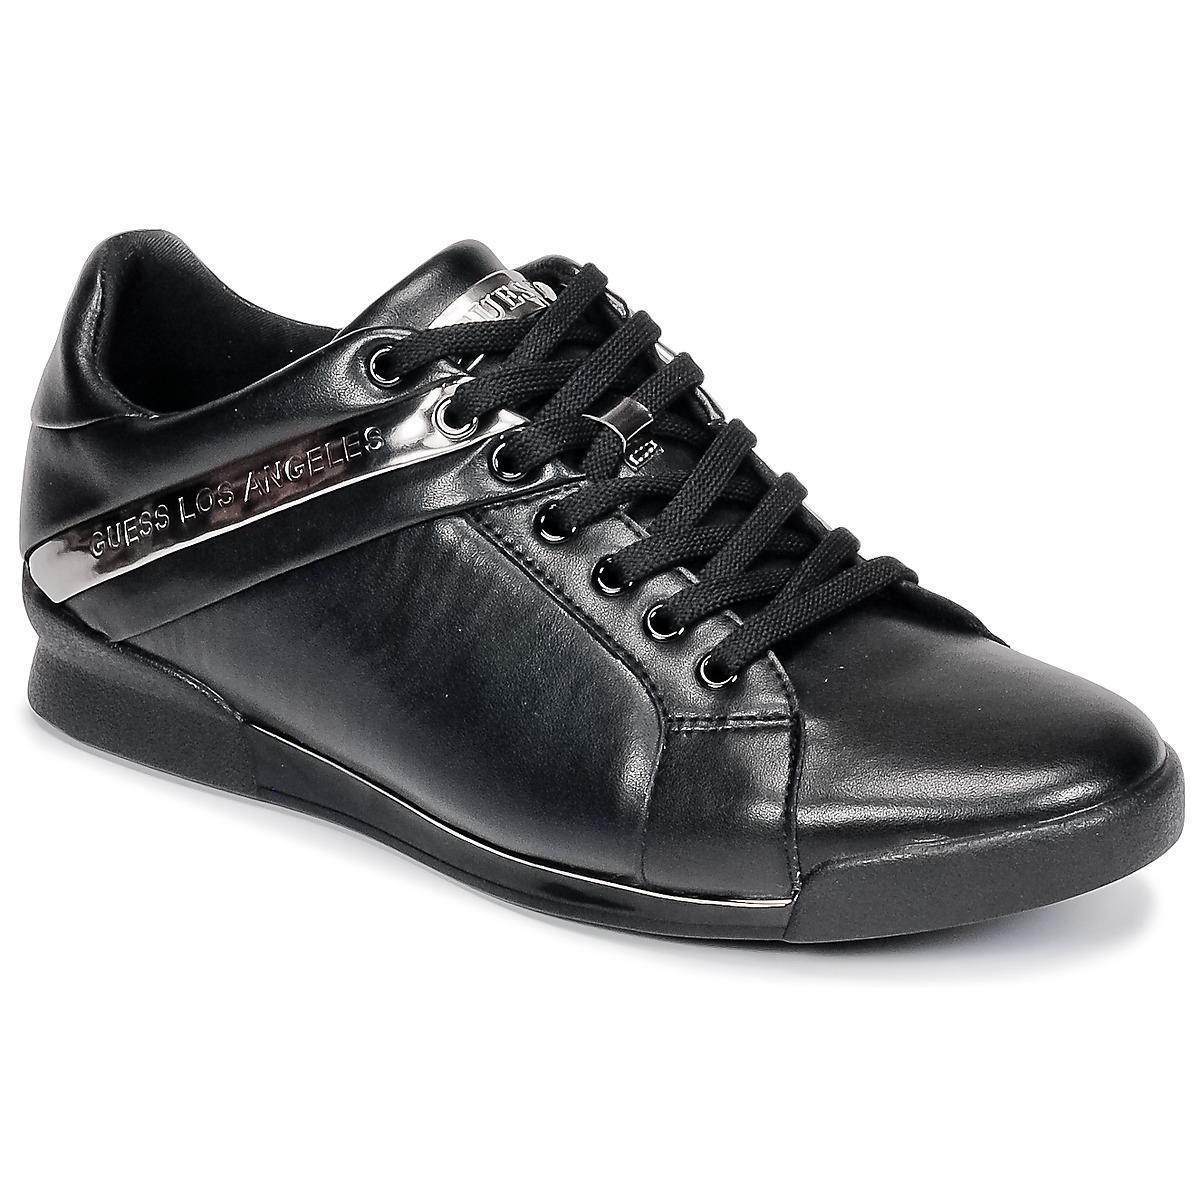 Guess NEW GEORG Schwarz - Kostenloser Versand bei Spartoode ! - Schuhe Sneaker Low Herren 87,50 €